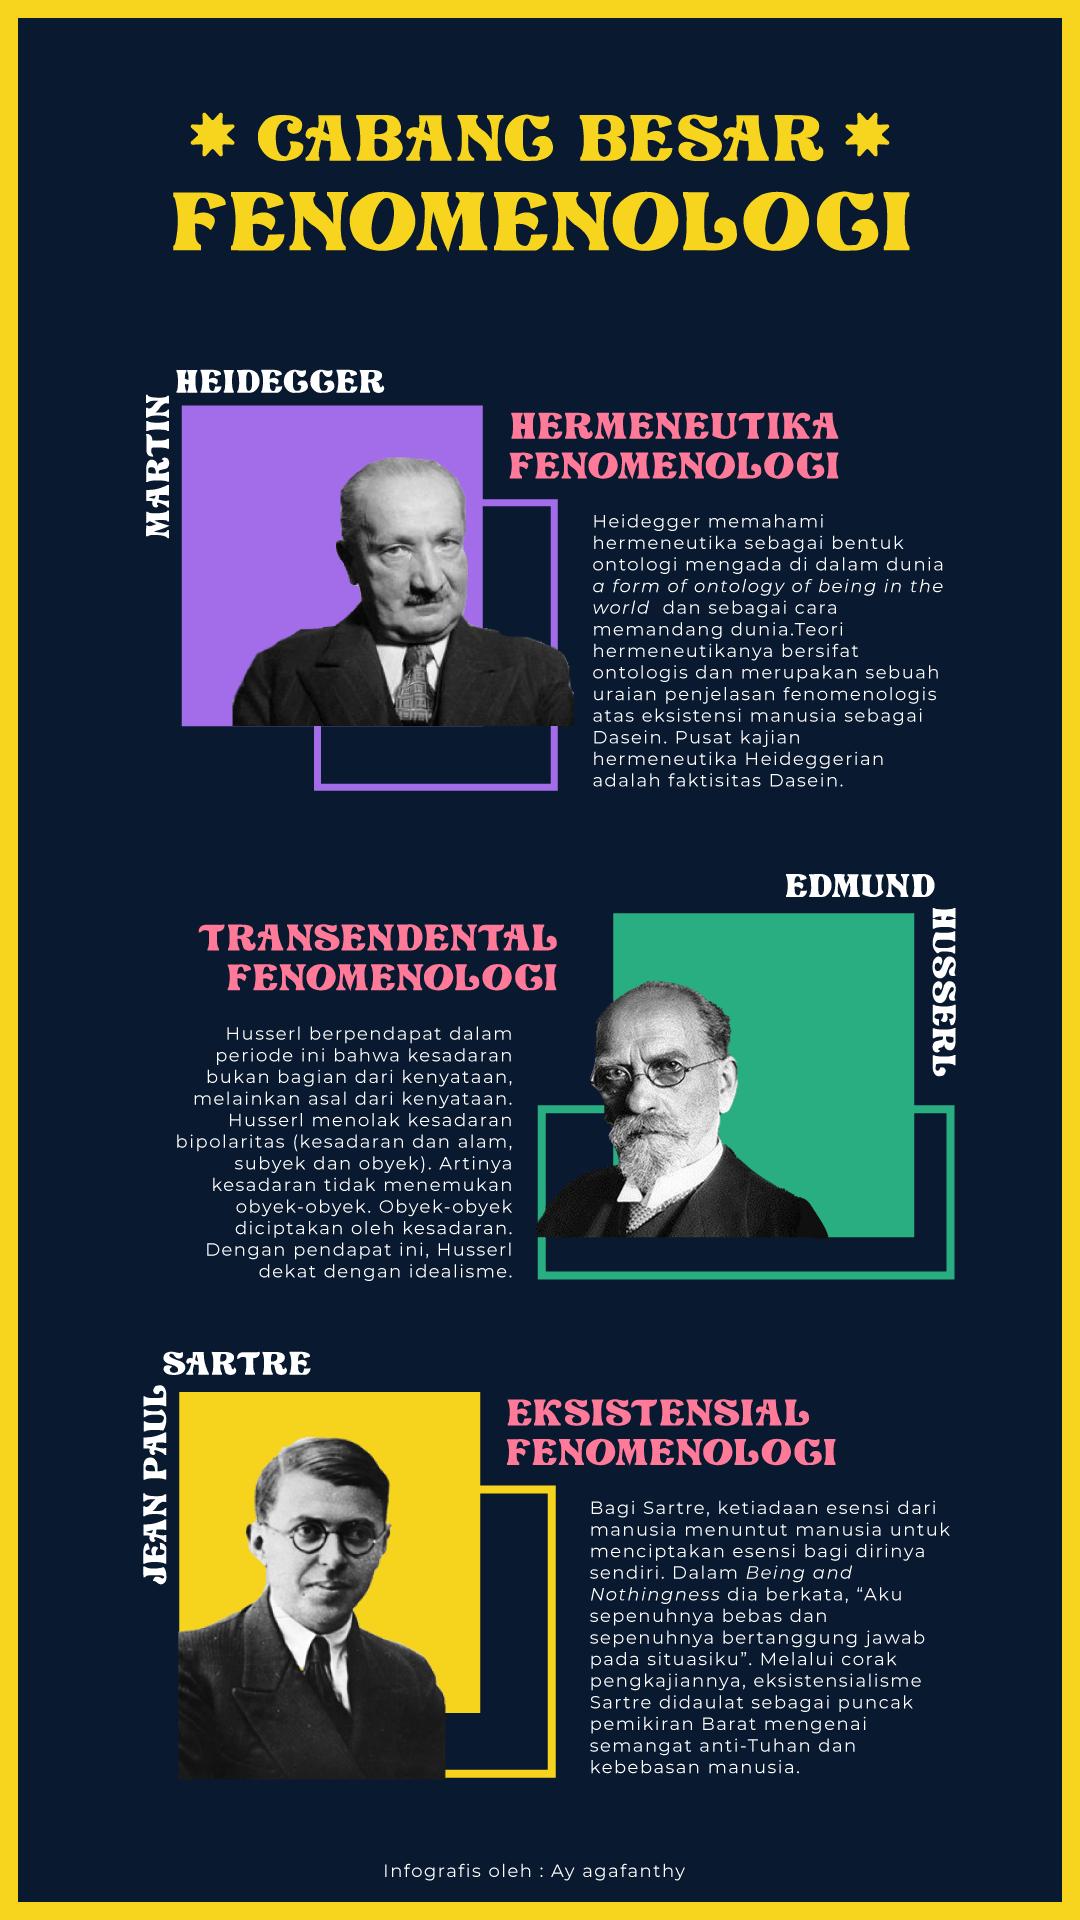 Cabang Besar Fenomenologi